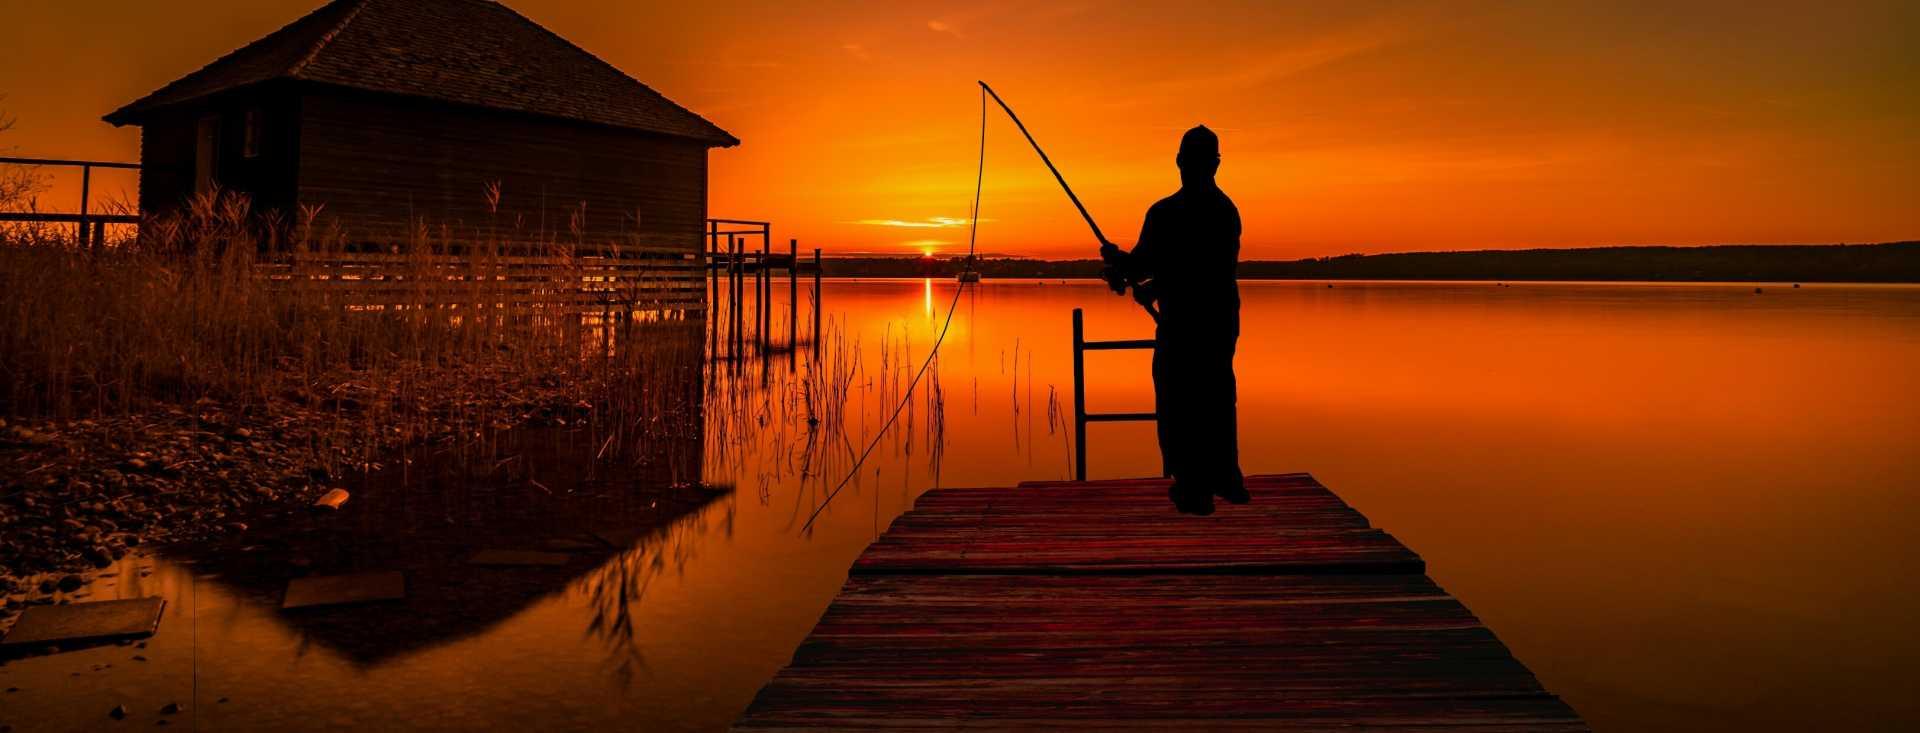 fishing-fisherman-lake-hobby-nature-sports-1437559-pxhere.com